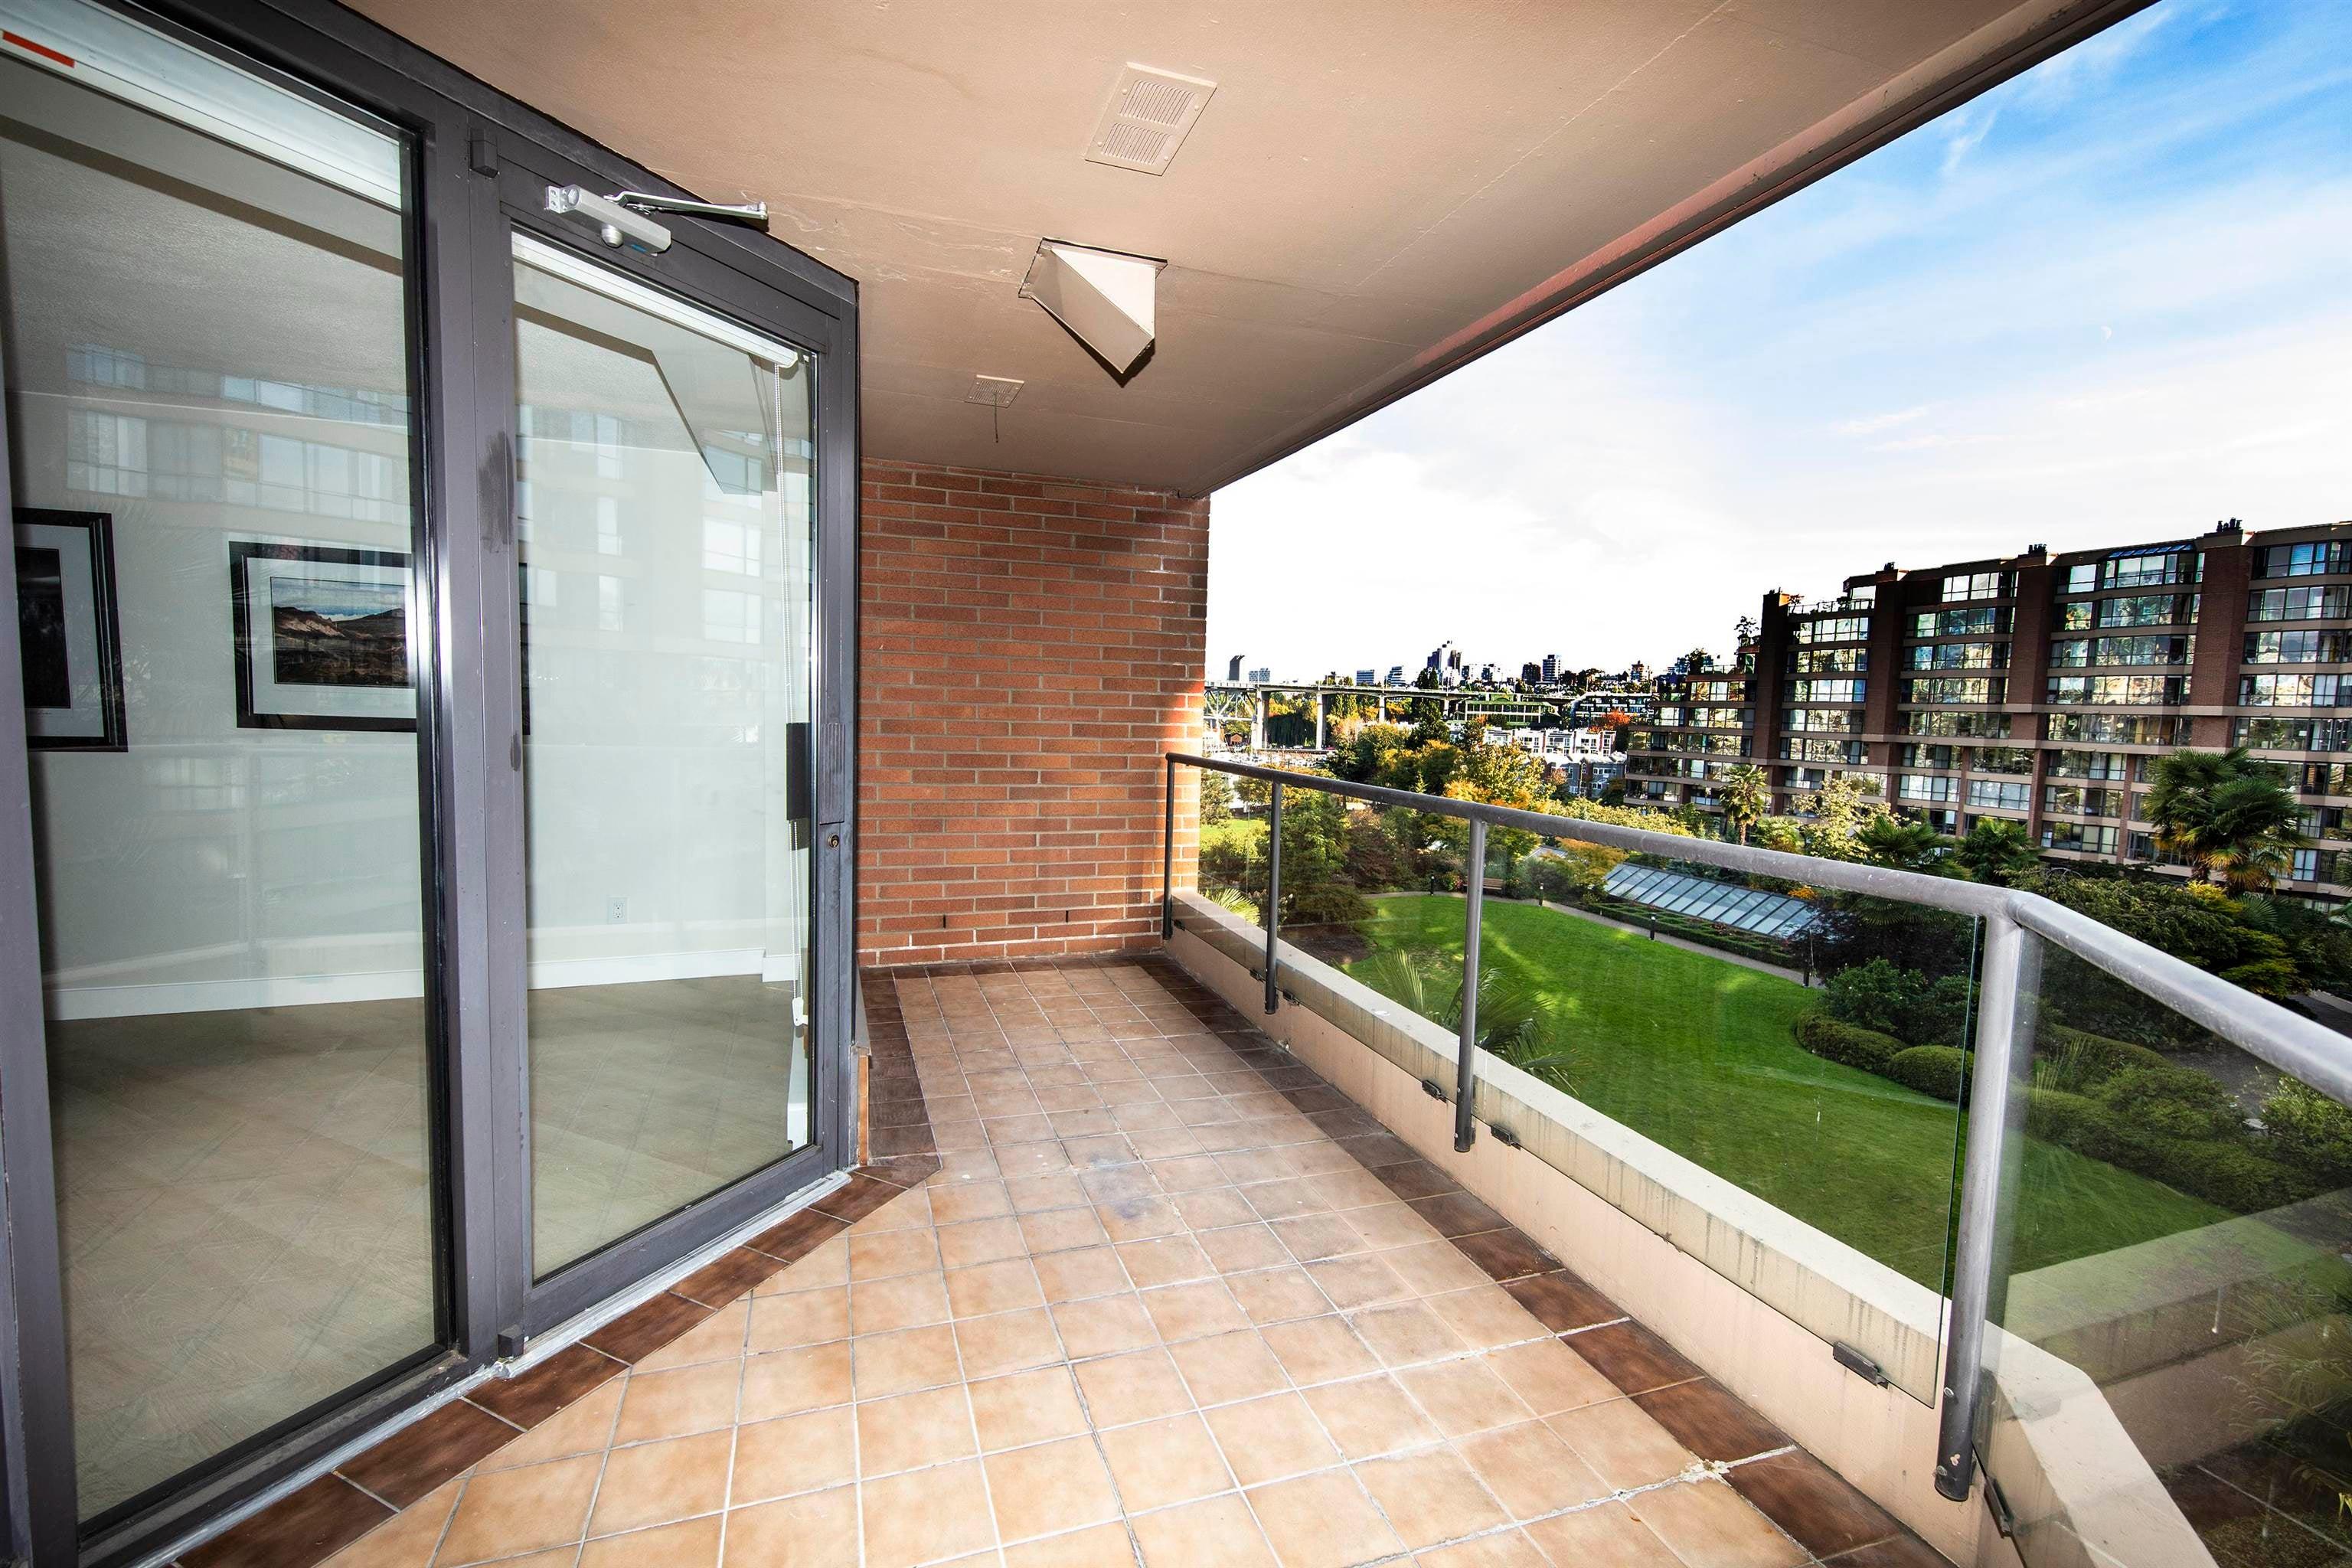 406 1450 PENNYFARTHING DRIVE - False Creek Apartment/Condo for sale, 2 Bedrooms (R2617259) - #33